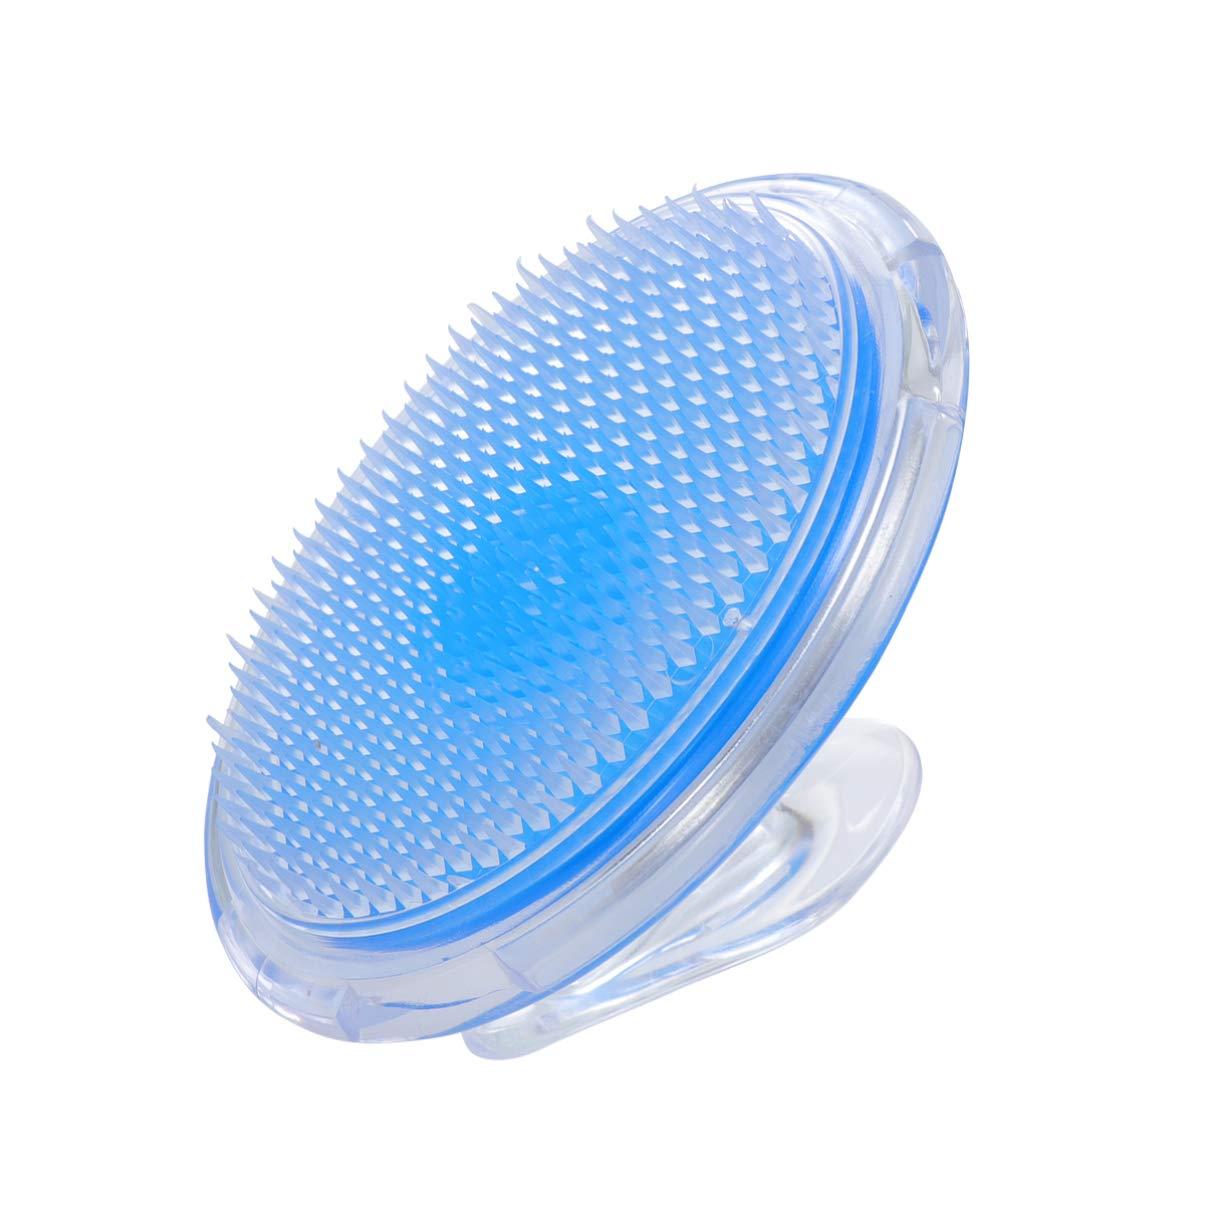 Exceart Scalp hair care brush hair shampoo brush massager brush Hair Comb Brush